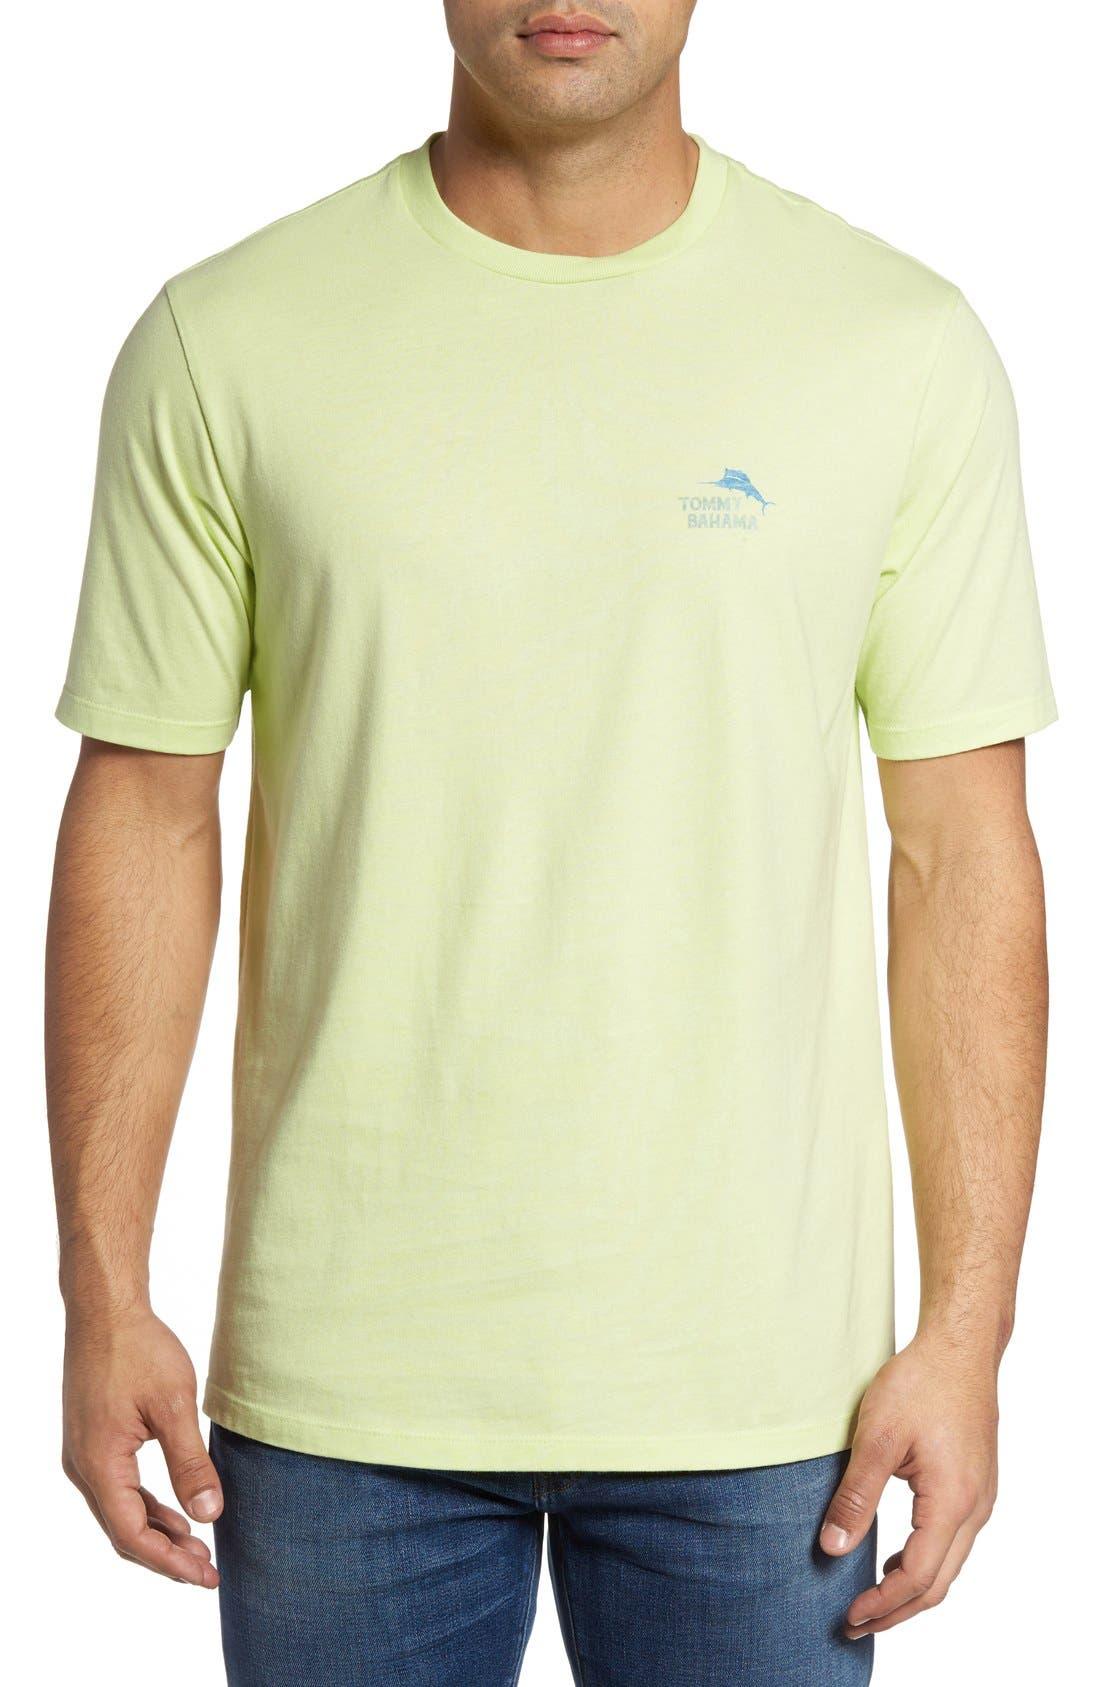 Alternate Image 2  - Tommy Bahama Keeping It Rio Graphic T-Shirt (Big & Tall)